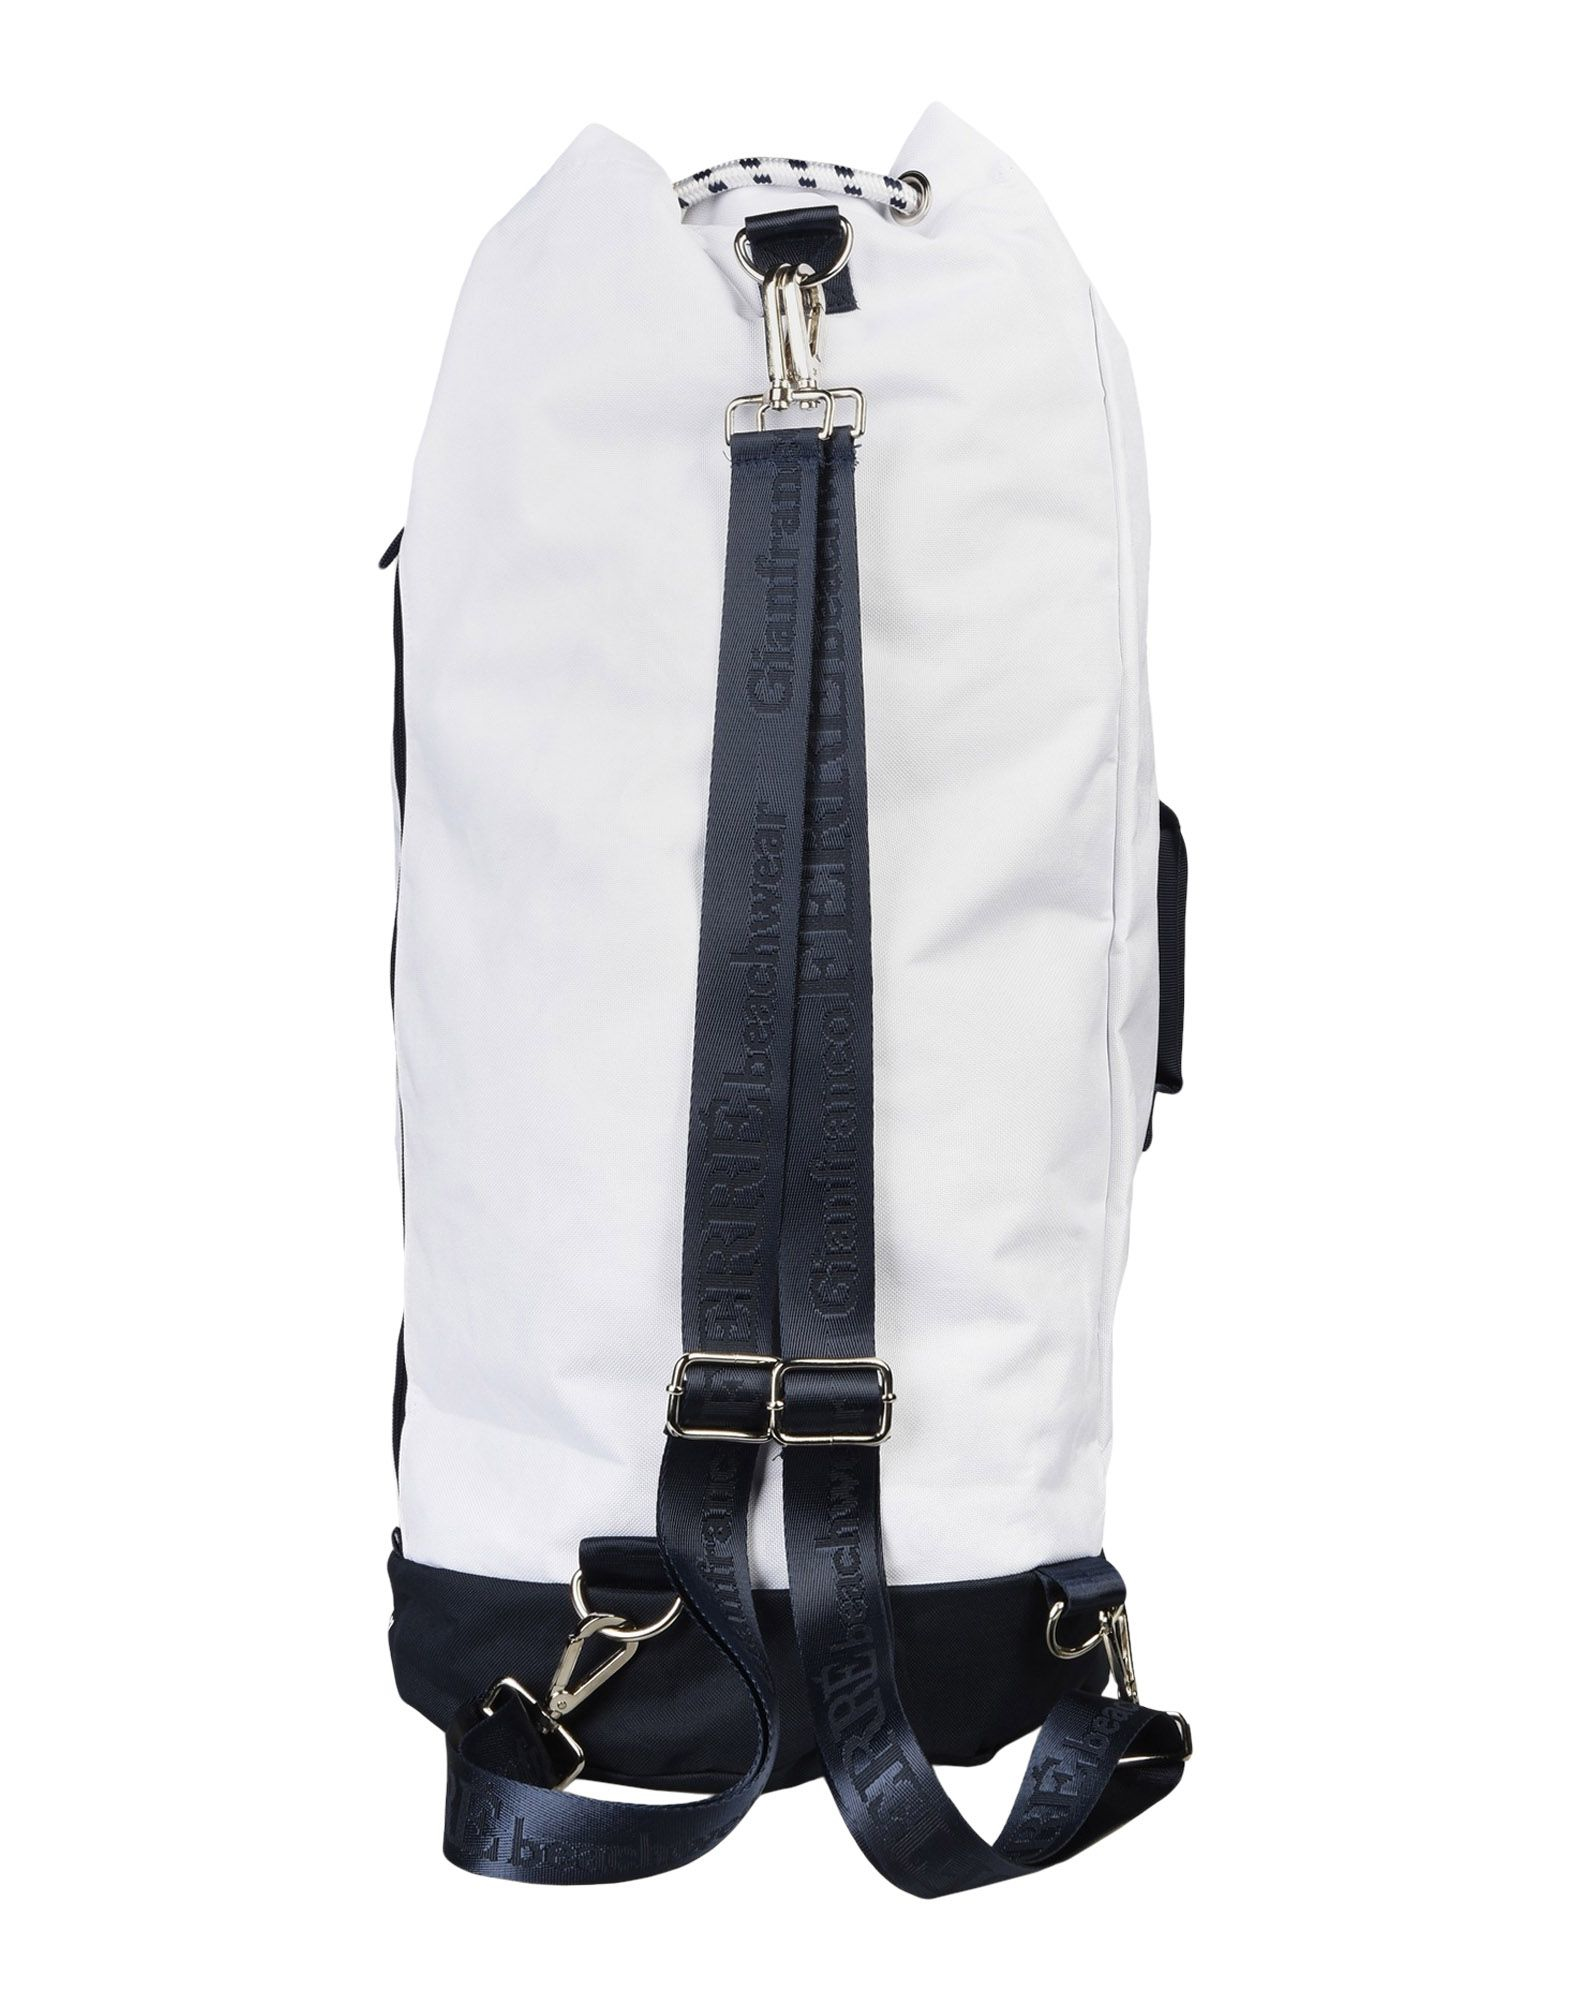 Gianfranco Ferré Canvas Backpacks & Bum Bags in Dark Blue (Blue)